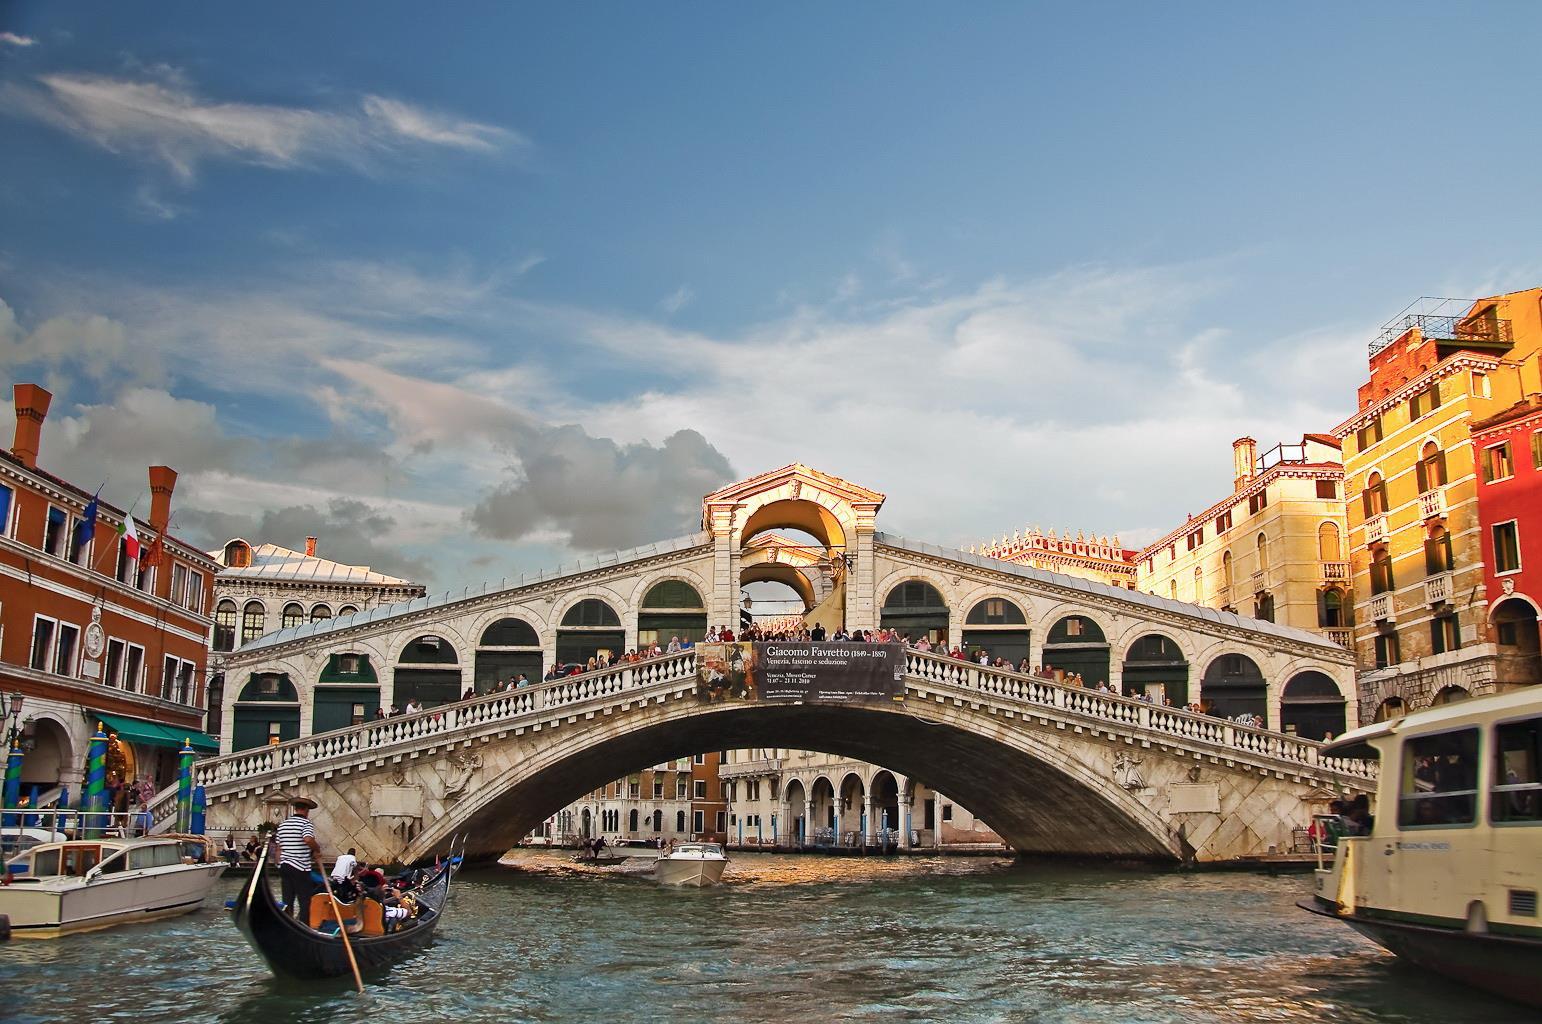 Rialto-Bridge, Things to do in Venice